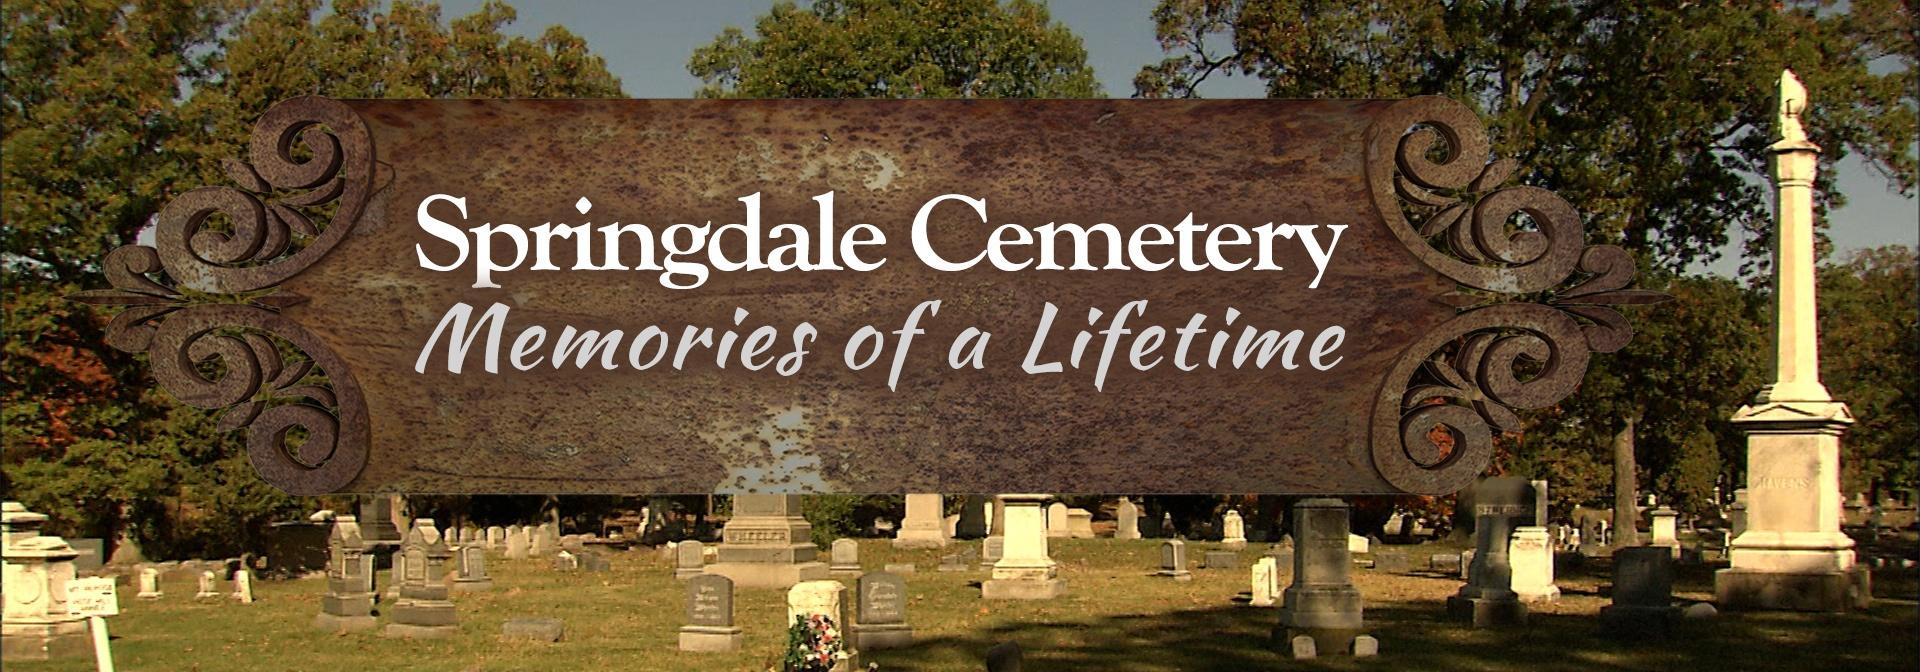 Springdale Cemetery: Memories of a Lifetime